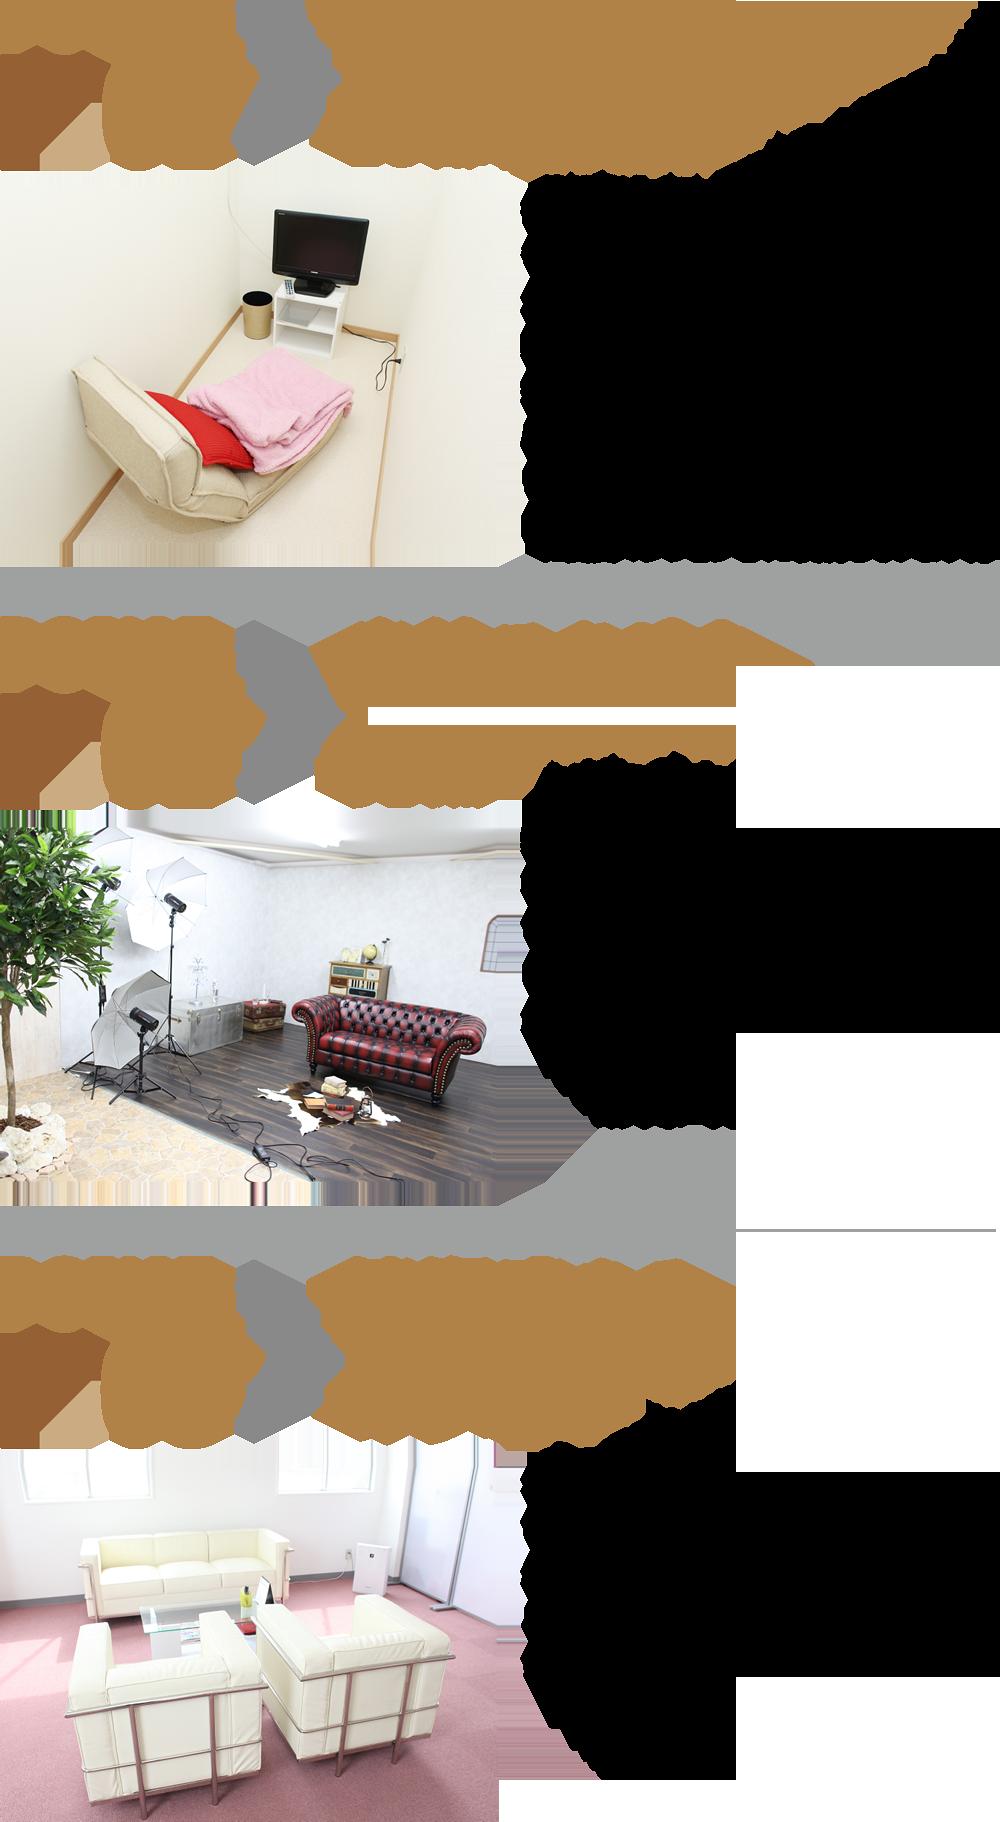 151118_lovelife_main_image_06